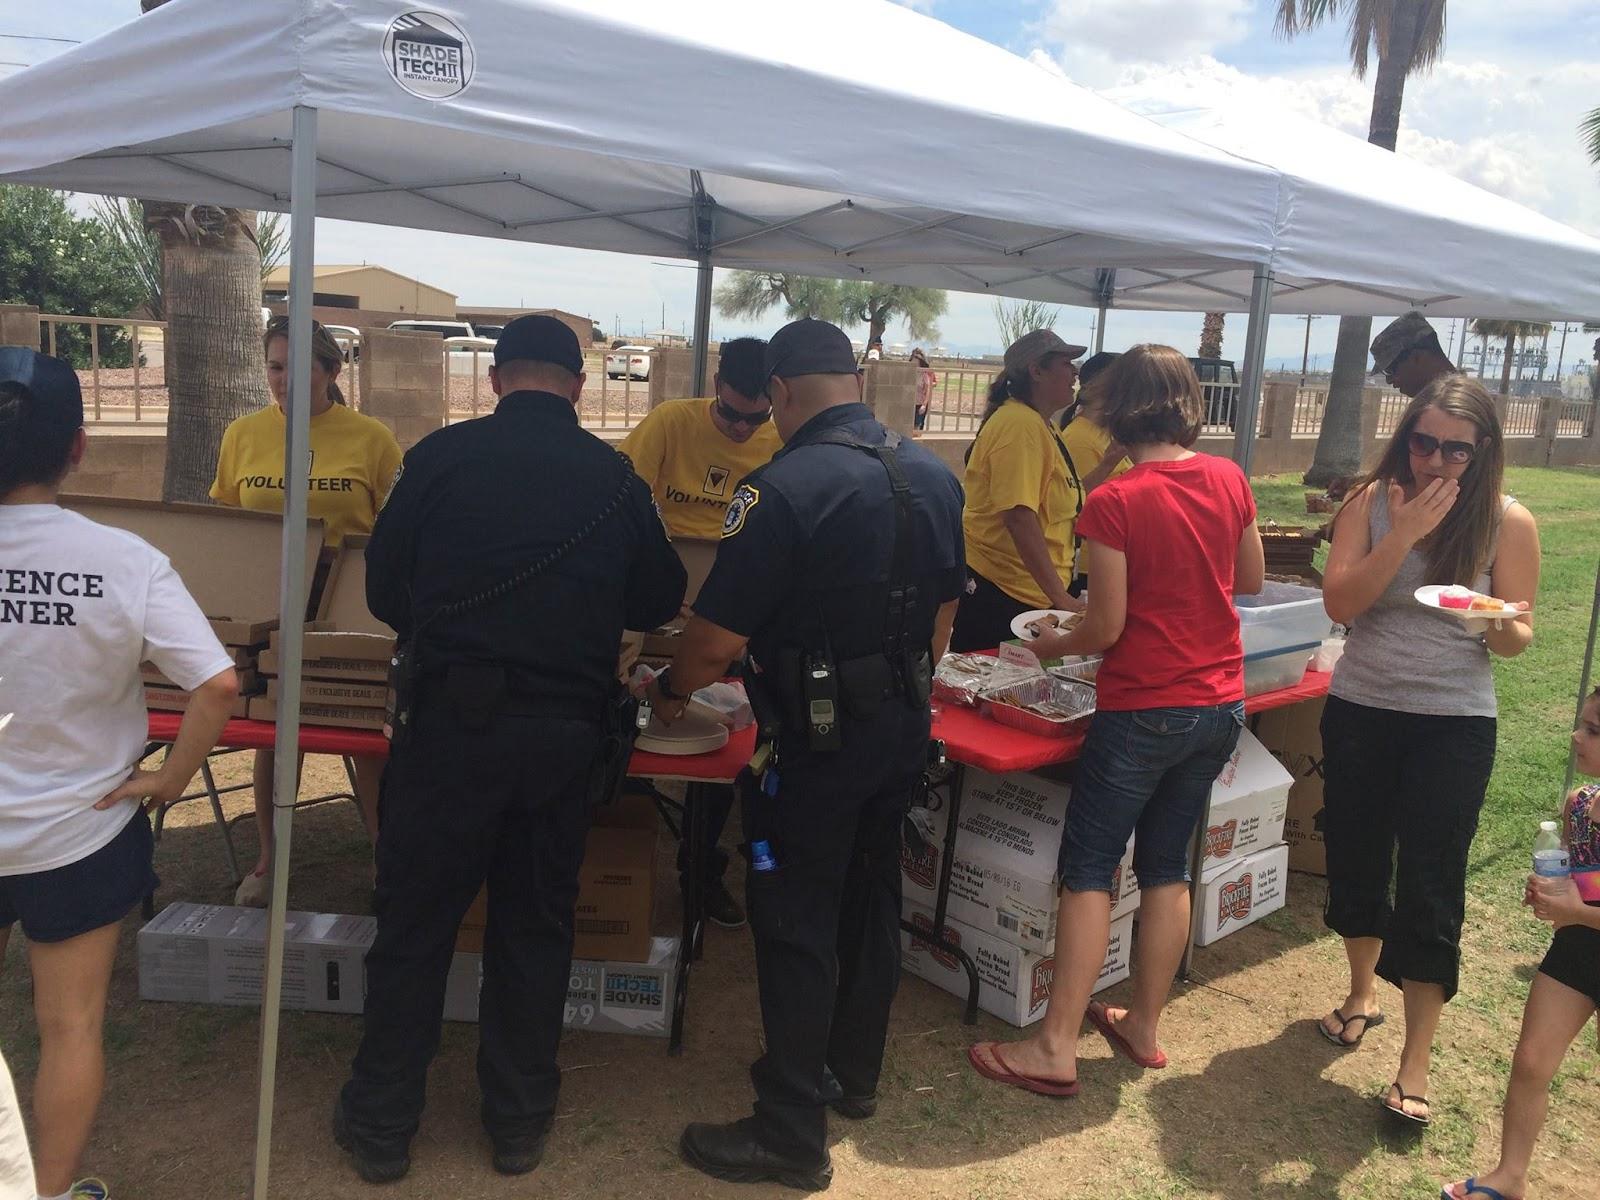 Tucson Thanks our Airmen and Families - 11890020_890713177669463_4606262927501970869_o.jpg